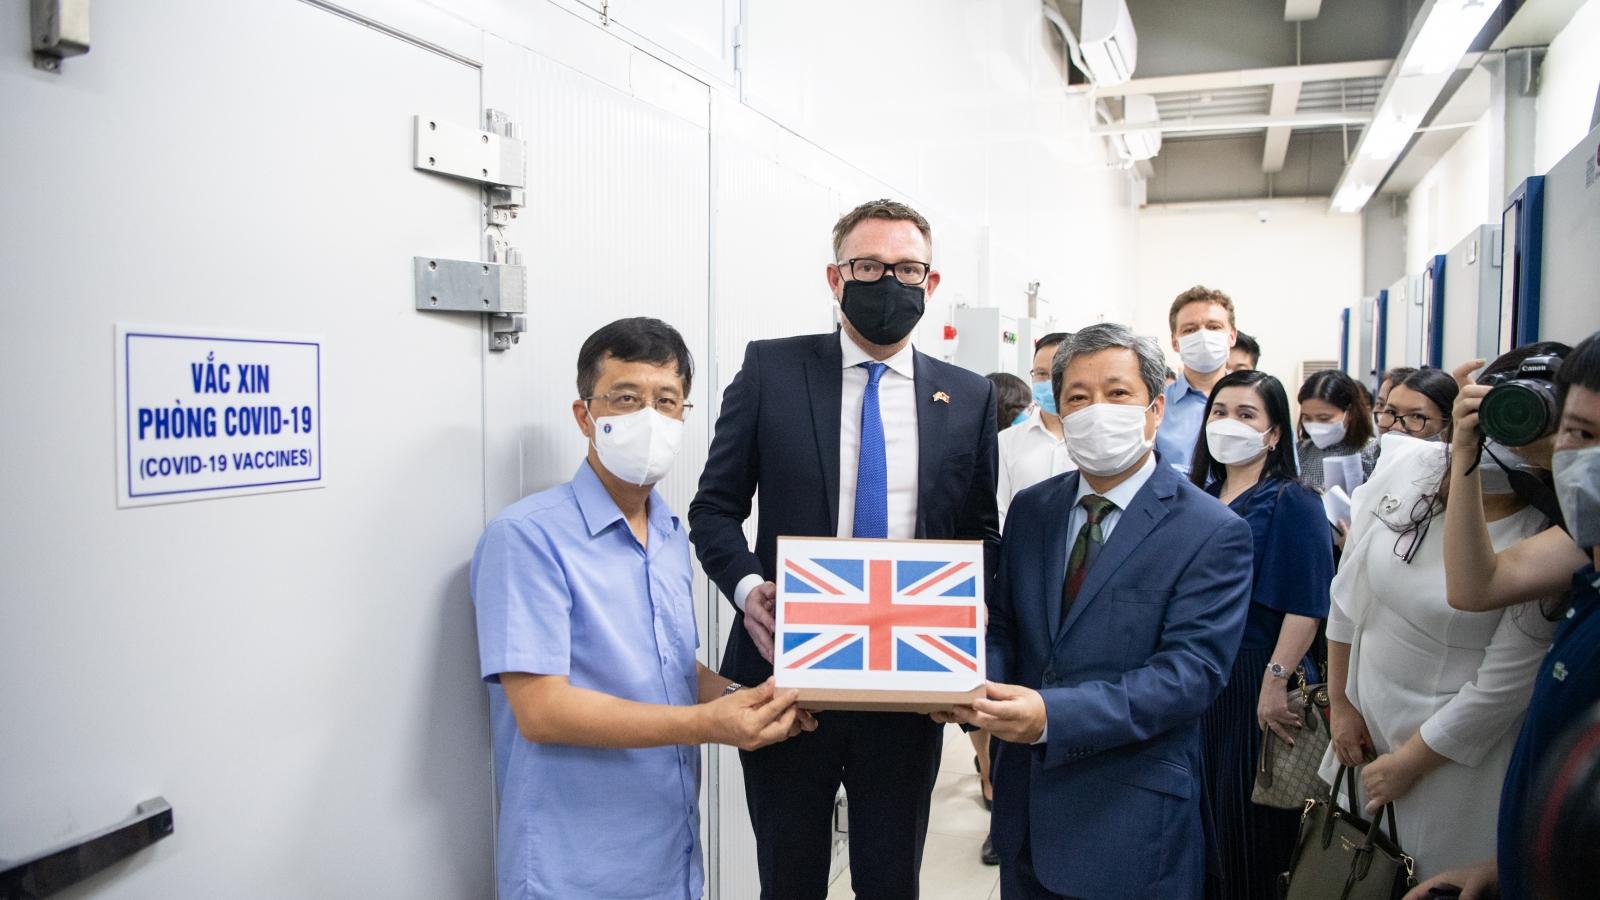 UK offers 415,000 AstraZeneca vaccine doses to Vietnam